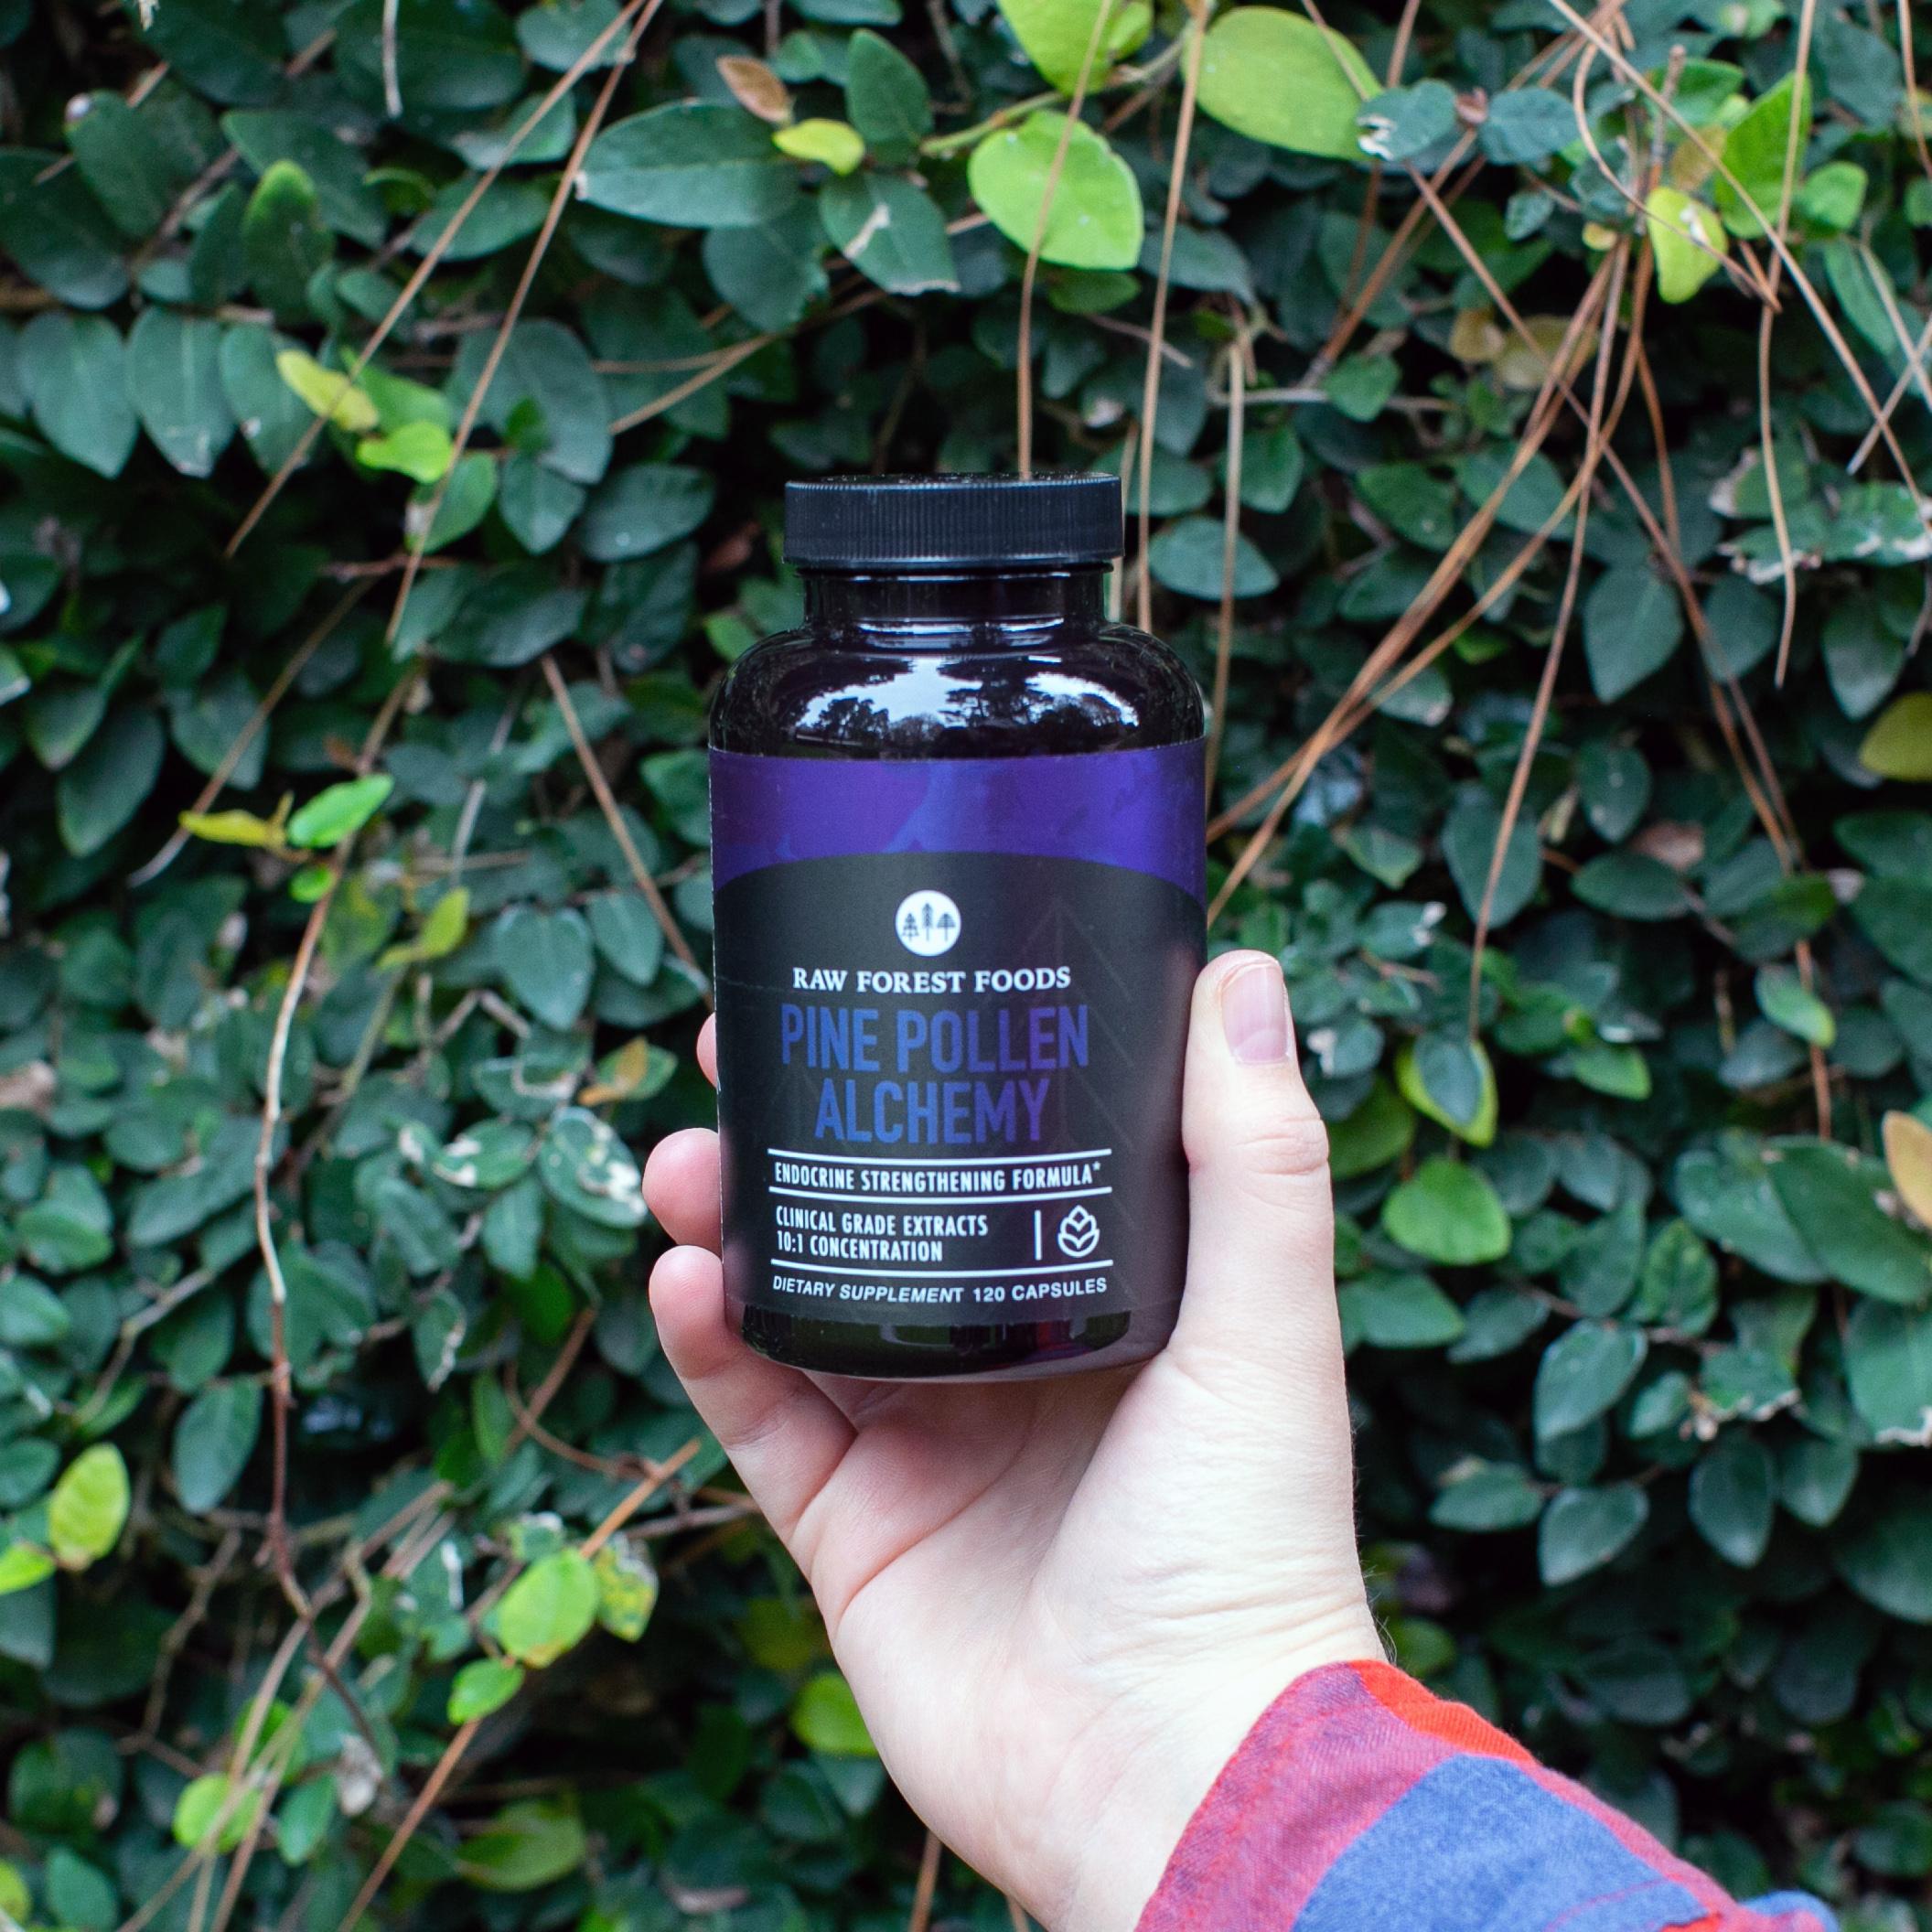 Endocrine Strengthening Formula: The Alchemy of Pine Pollen - Vegan/Vegetarian Capsules